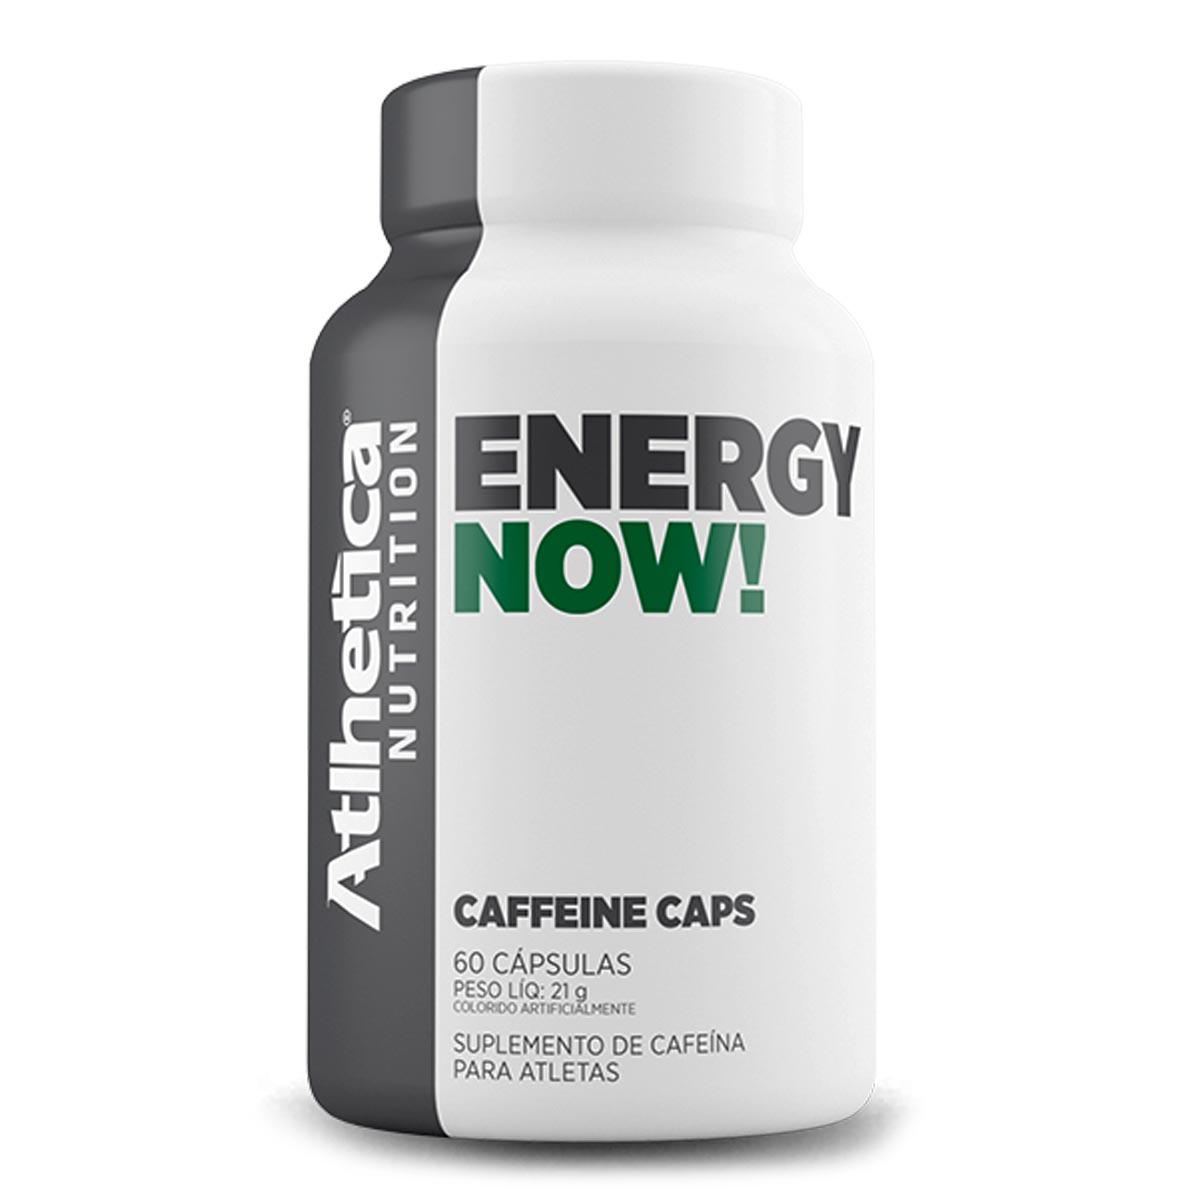 Energy Now! - Cafeina 210mg - 60 Capsulas